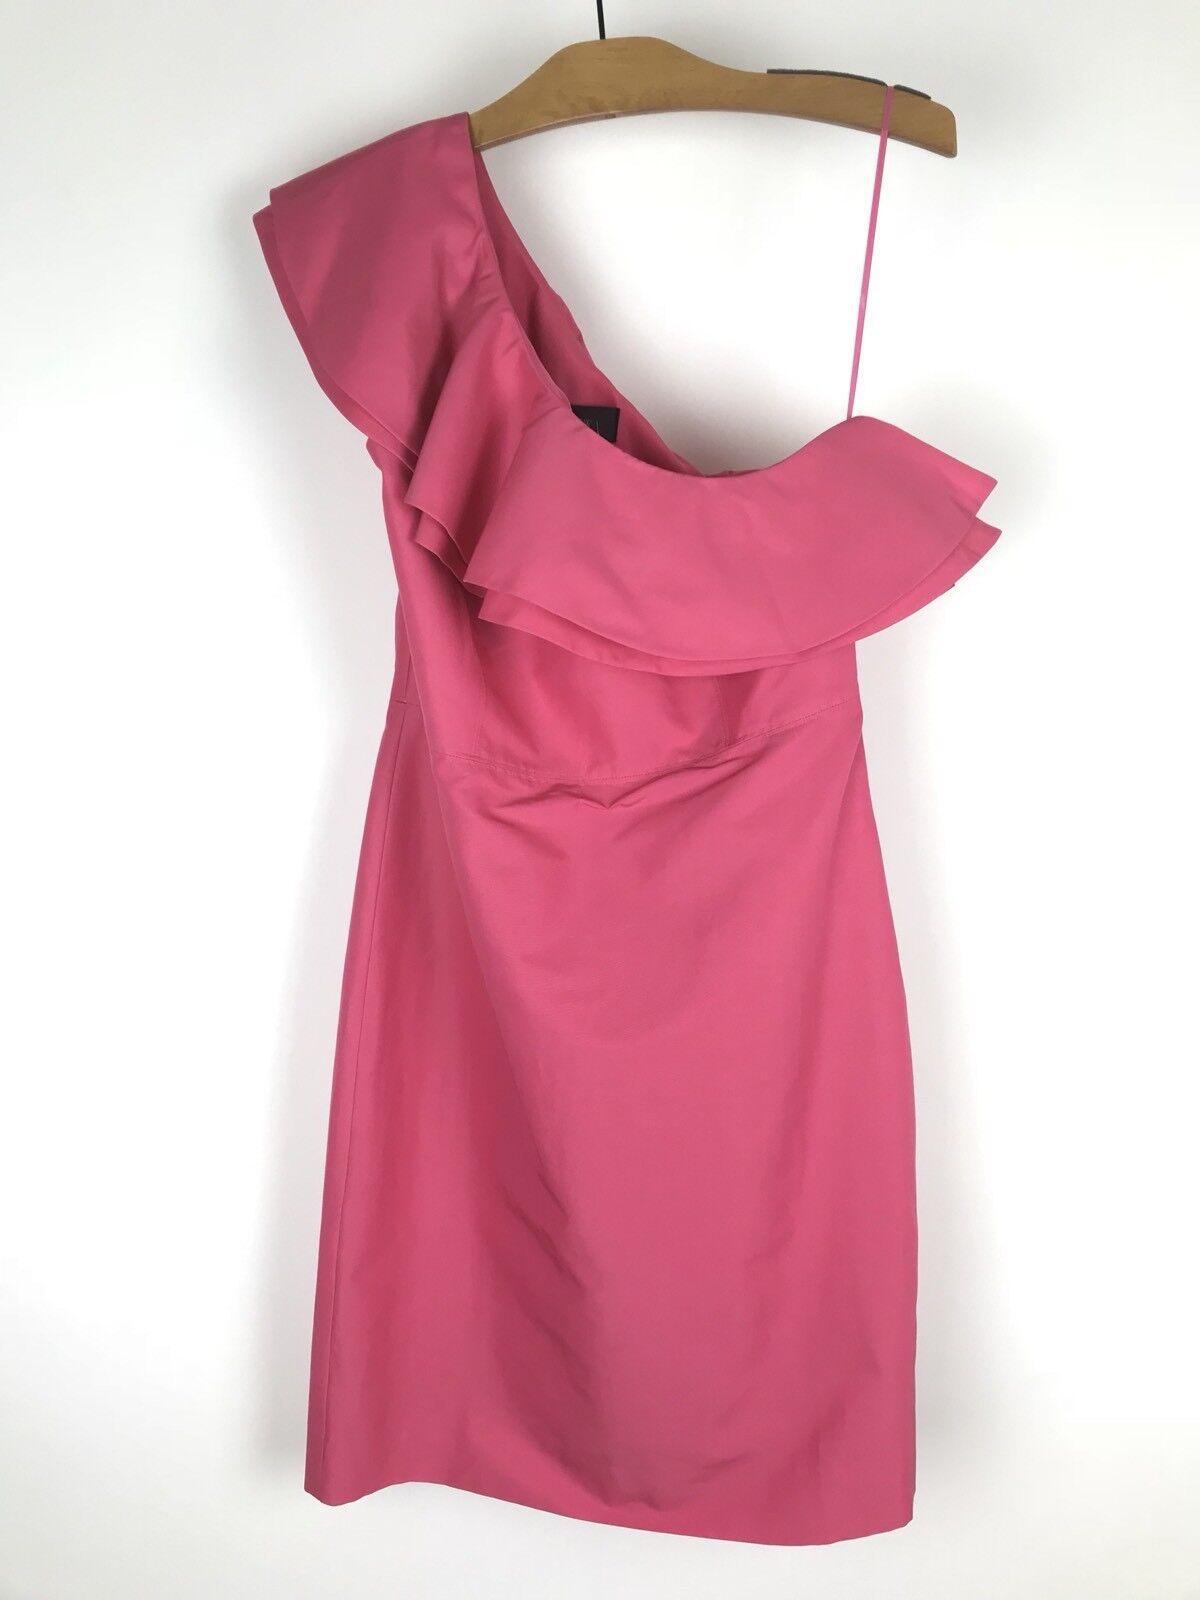 NWT J.Crew One Shoulder Ruffle Sheath Dress in Faille Silk Blend Pink Sz 8